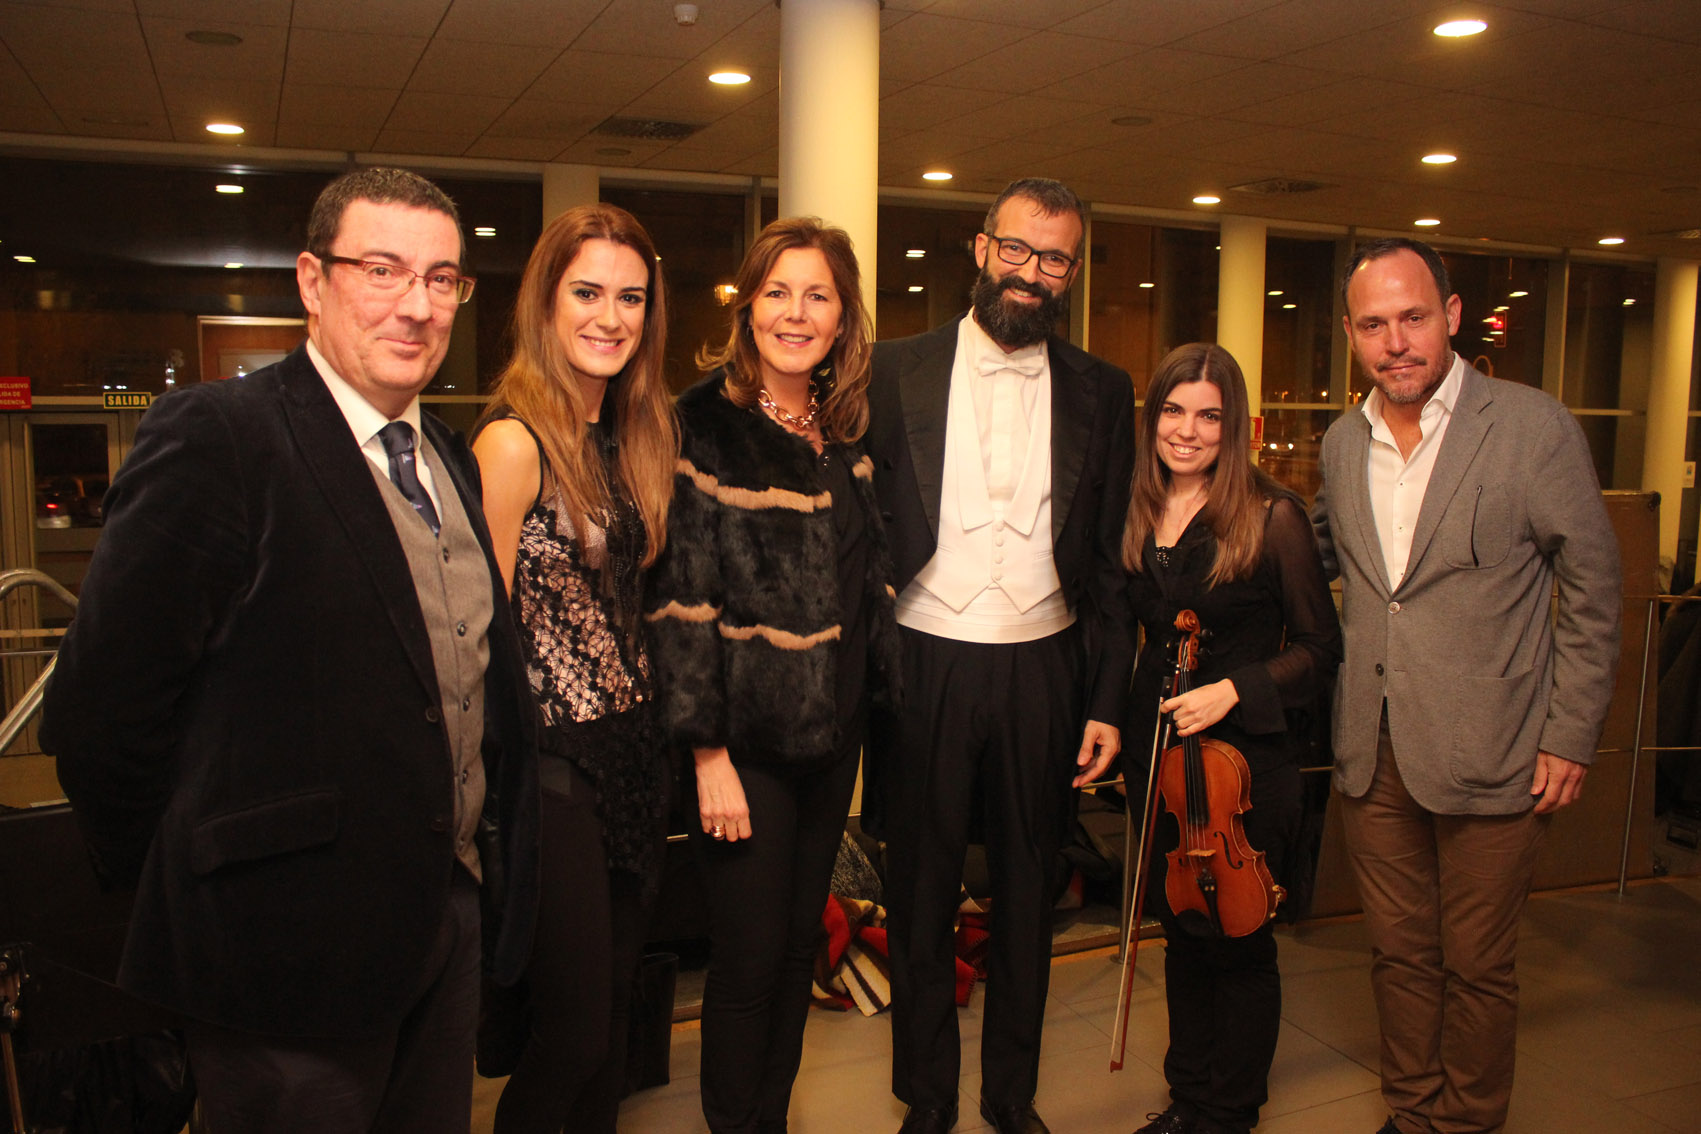 Luis Naranjo, Elisa Urrestarazu, Rosa Vera, Diego Jesús González, Alicia Ruiz y Juan Maldonado